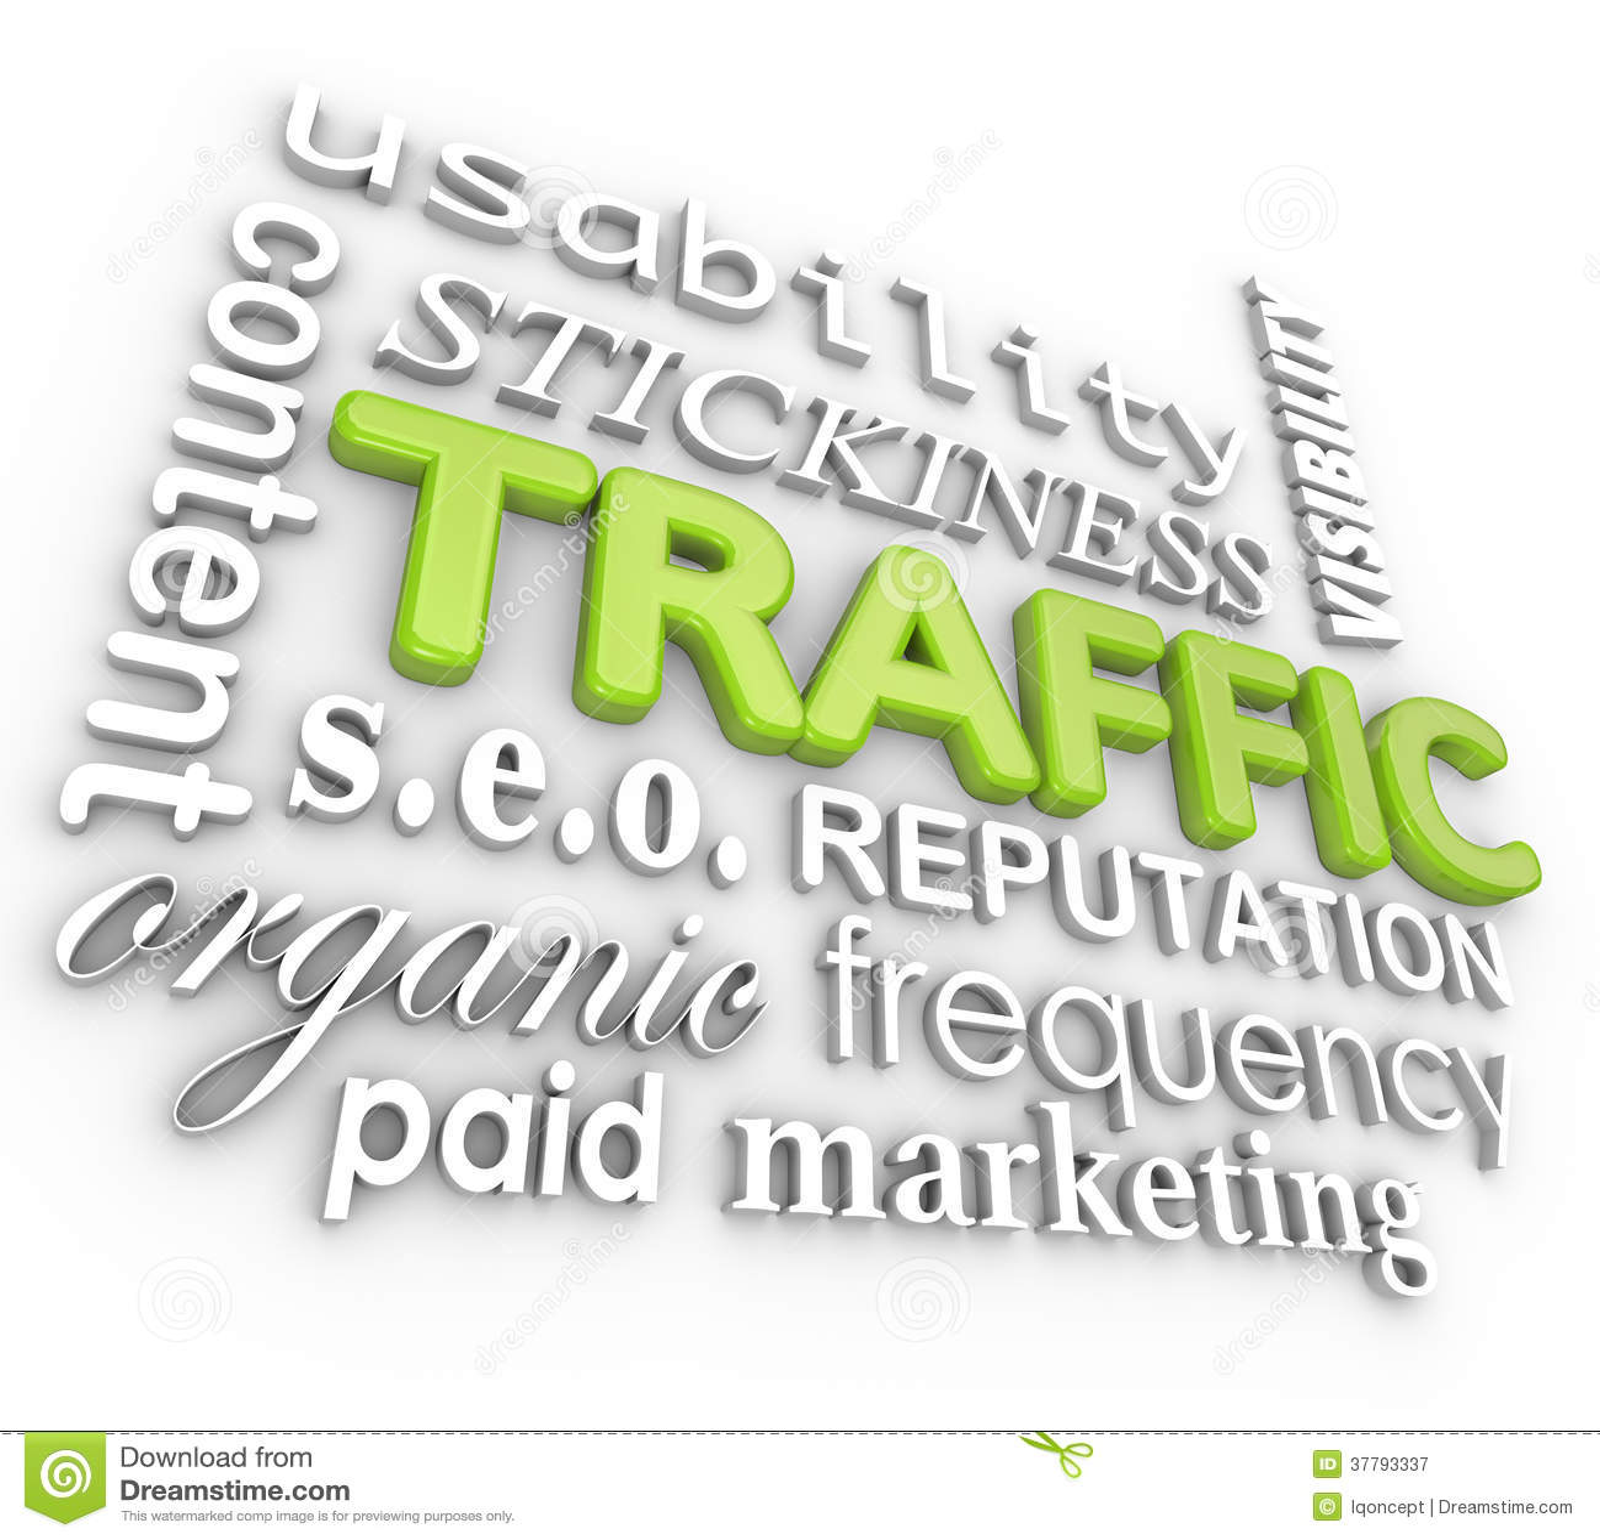 Web Traffic 3D Word Collage Online Reputation Website